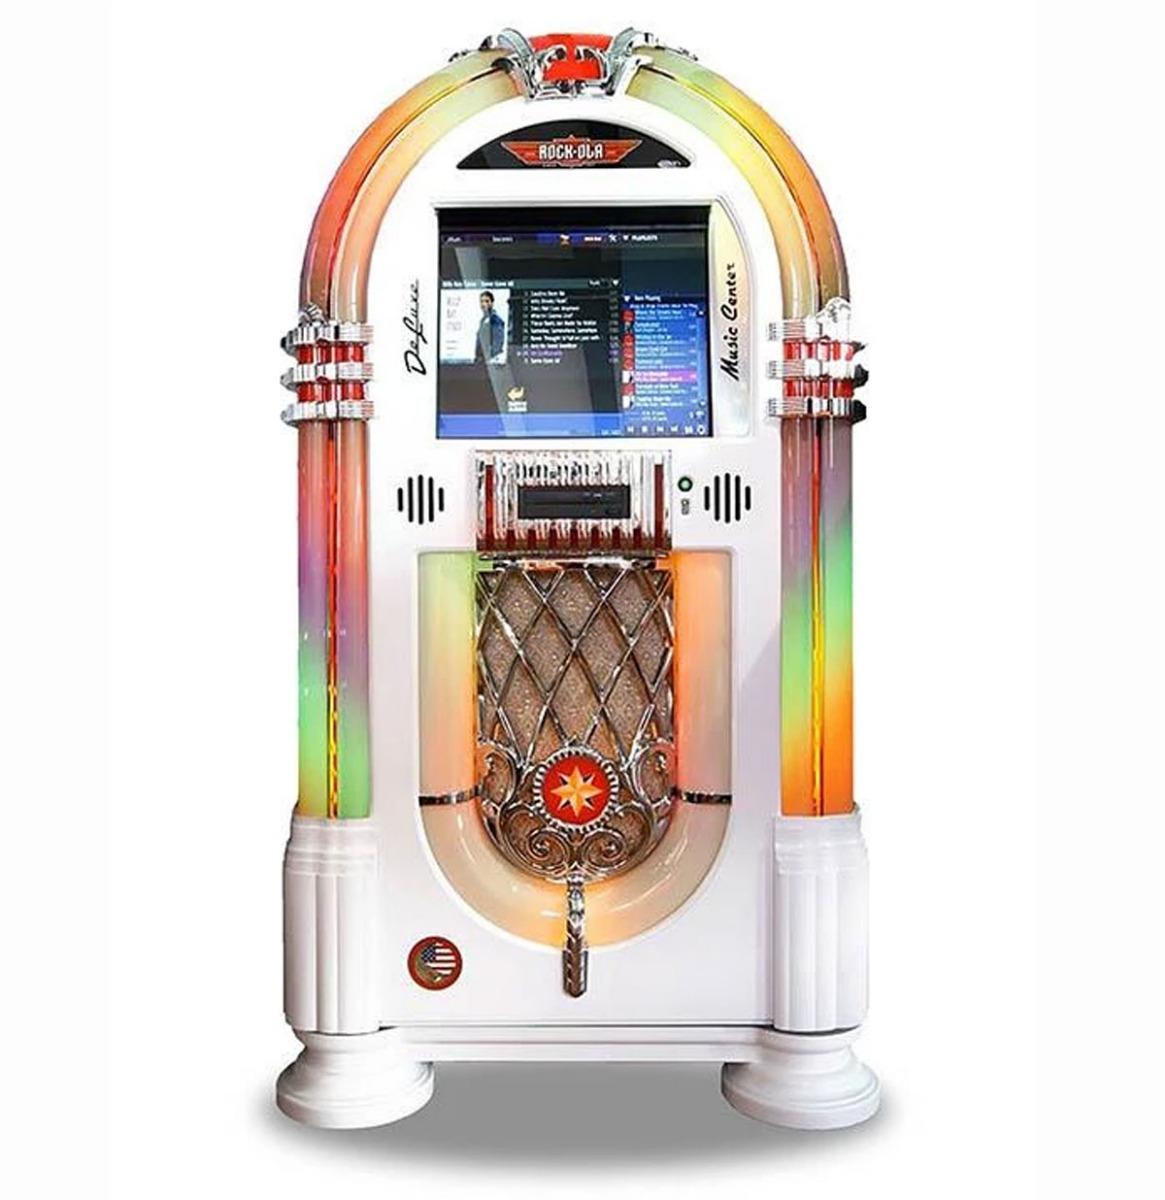 Rock-Ola Bubbler Digital Music Center Jukebox - Glanzend Wit